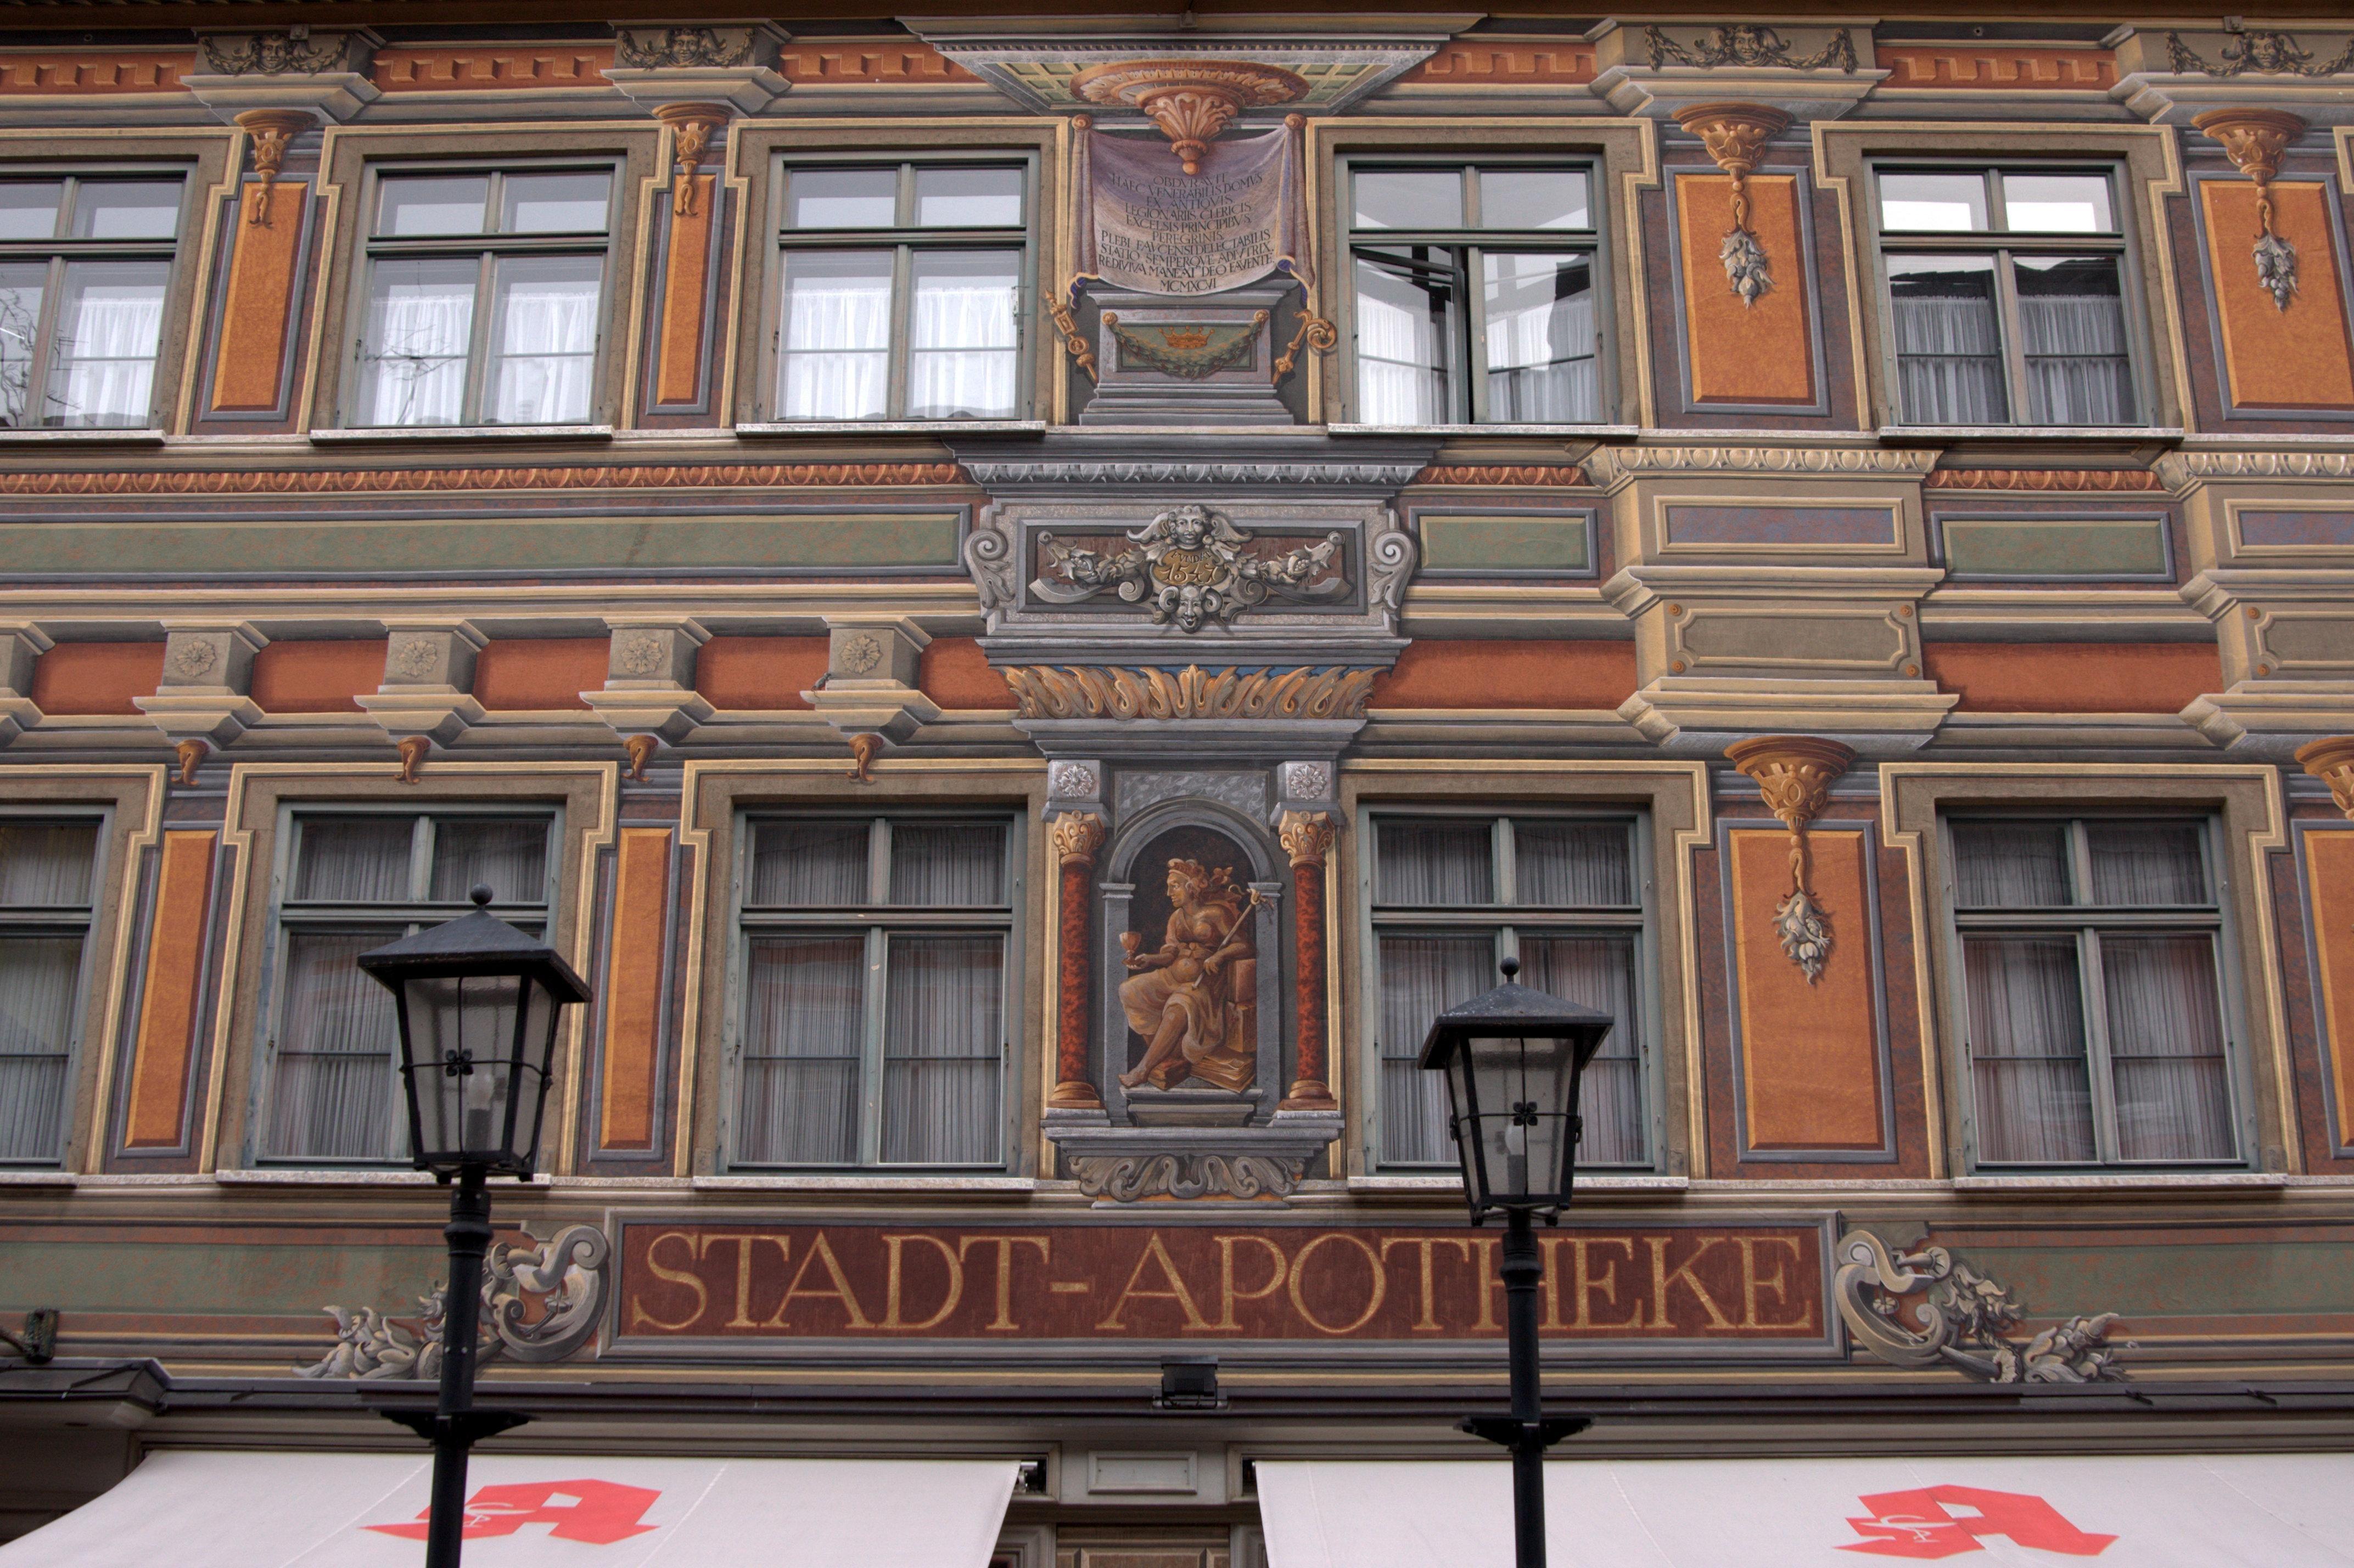 Stadt-Apotheke, Fussen, Bayern, Germany #apotheke #pharmacy #fussen #bayern #germany #deutschland #beautifulpics #beautifulimages #beautifulplaces #travel #beautifuldestinations